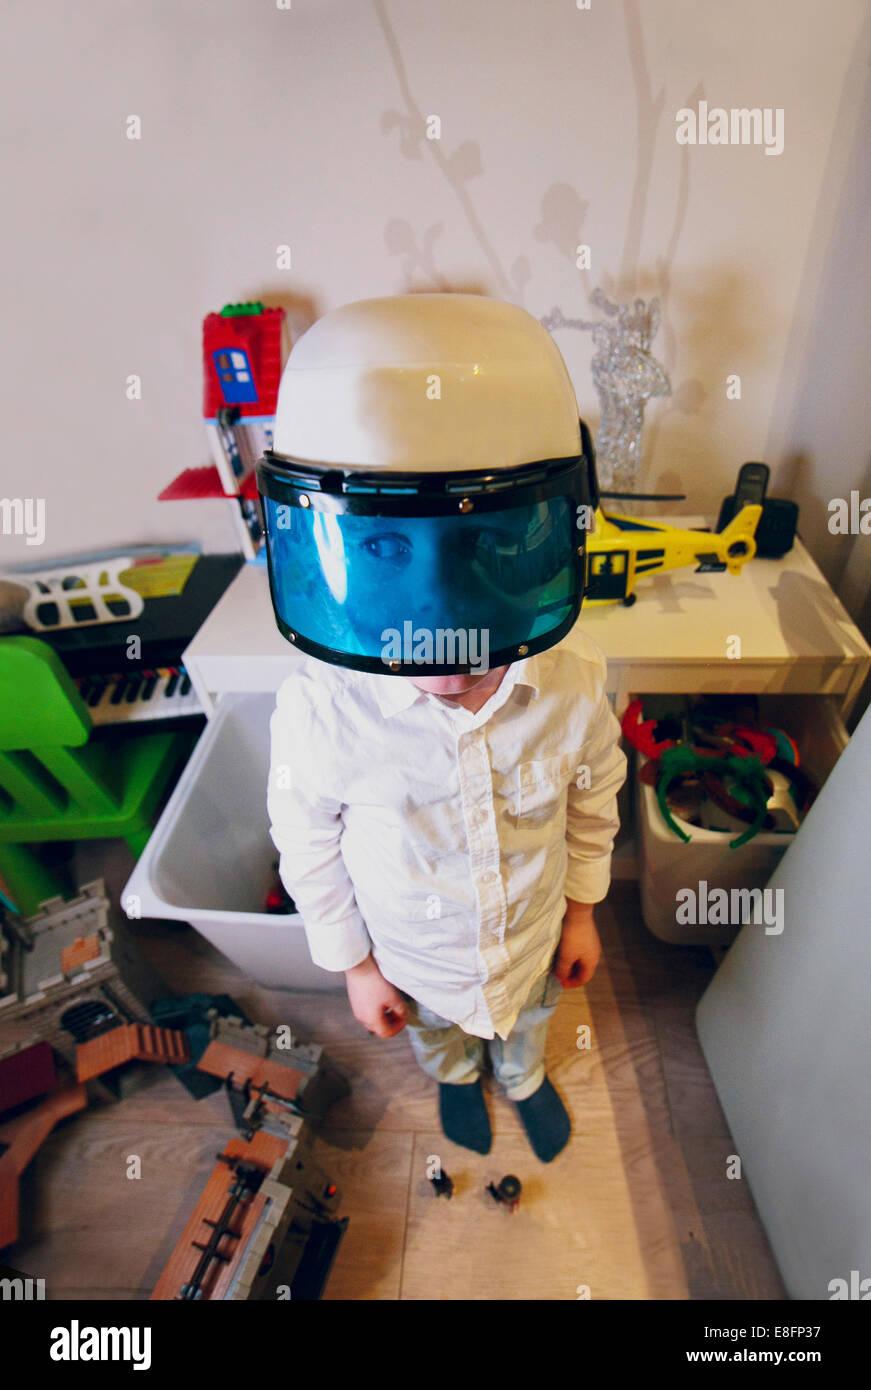 Netherlands, Boy (4-5) wearing policeman's helmet with visor - Stock Image